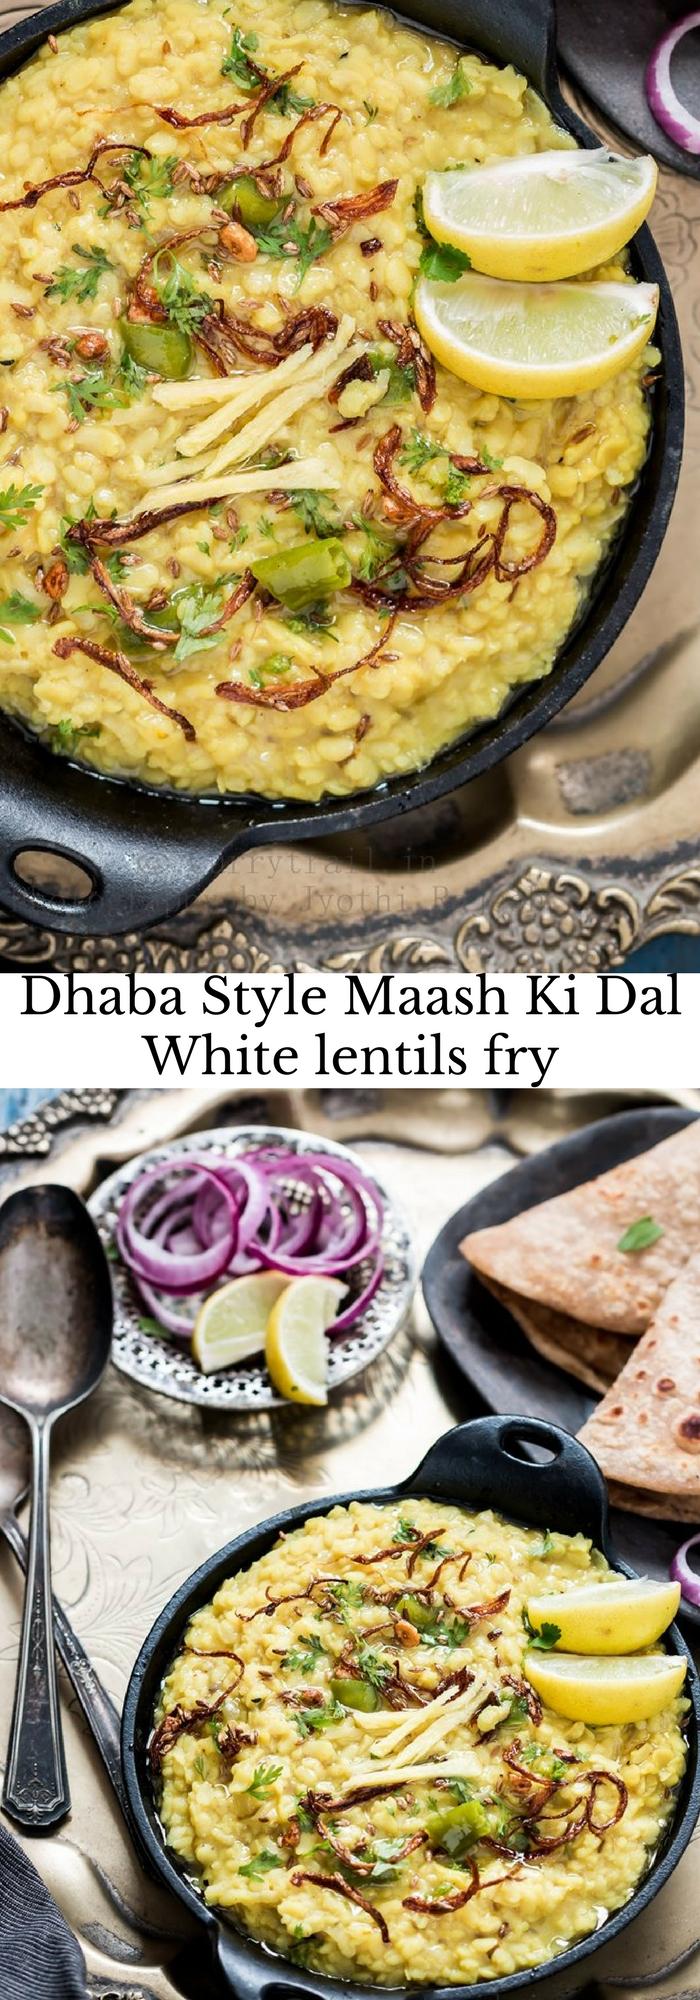 Dhaba Style Maash Ki DalWhite lentils fry